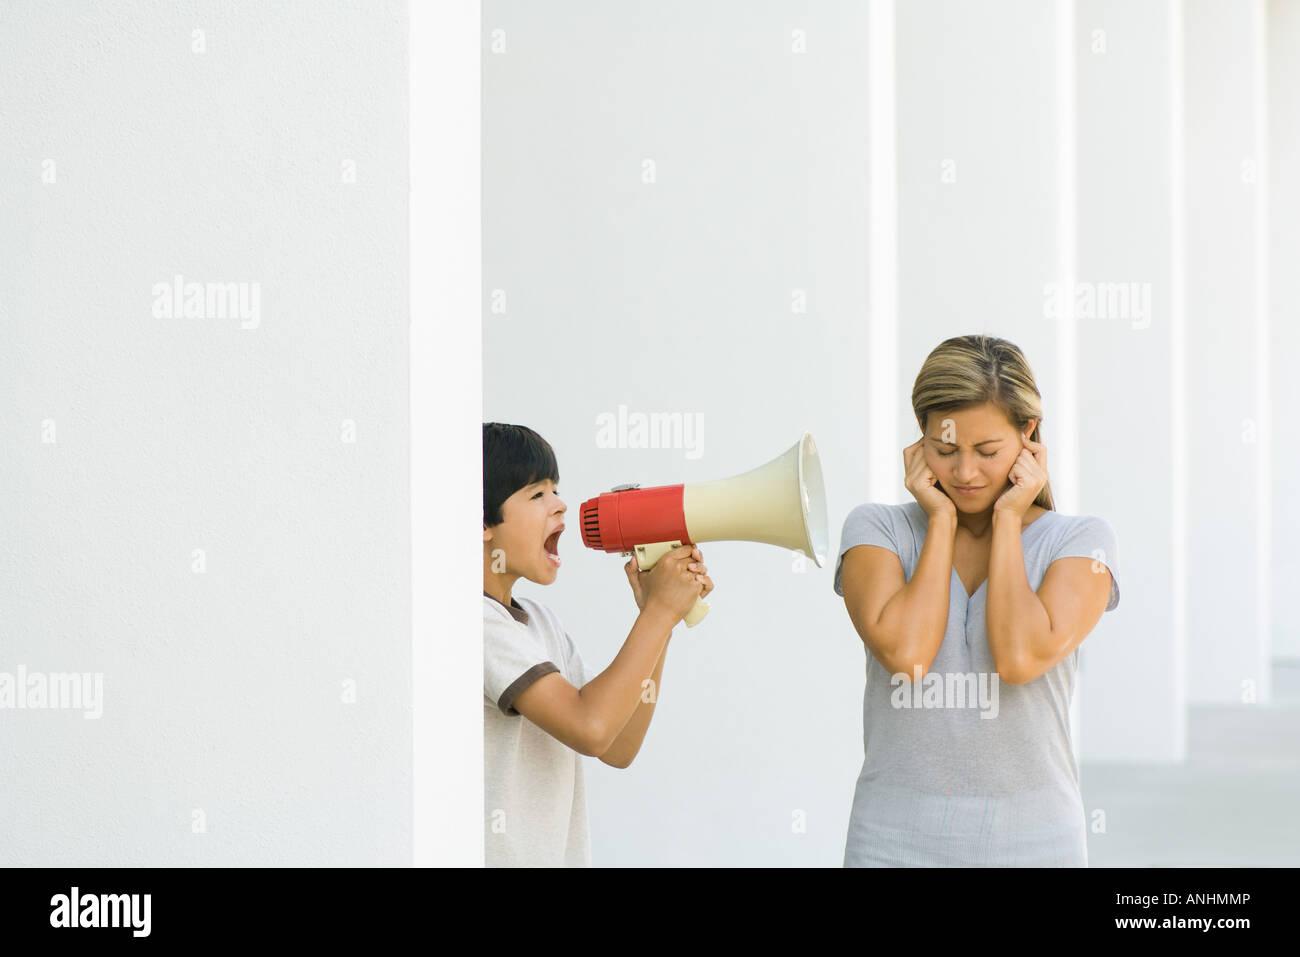 Boy screaming at mother through megaphone - Stock Image